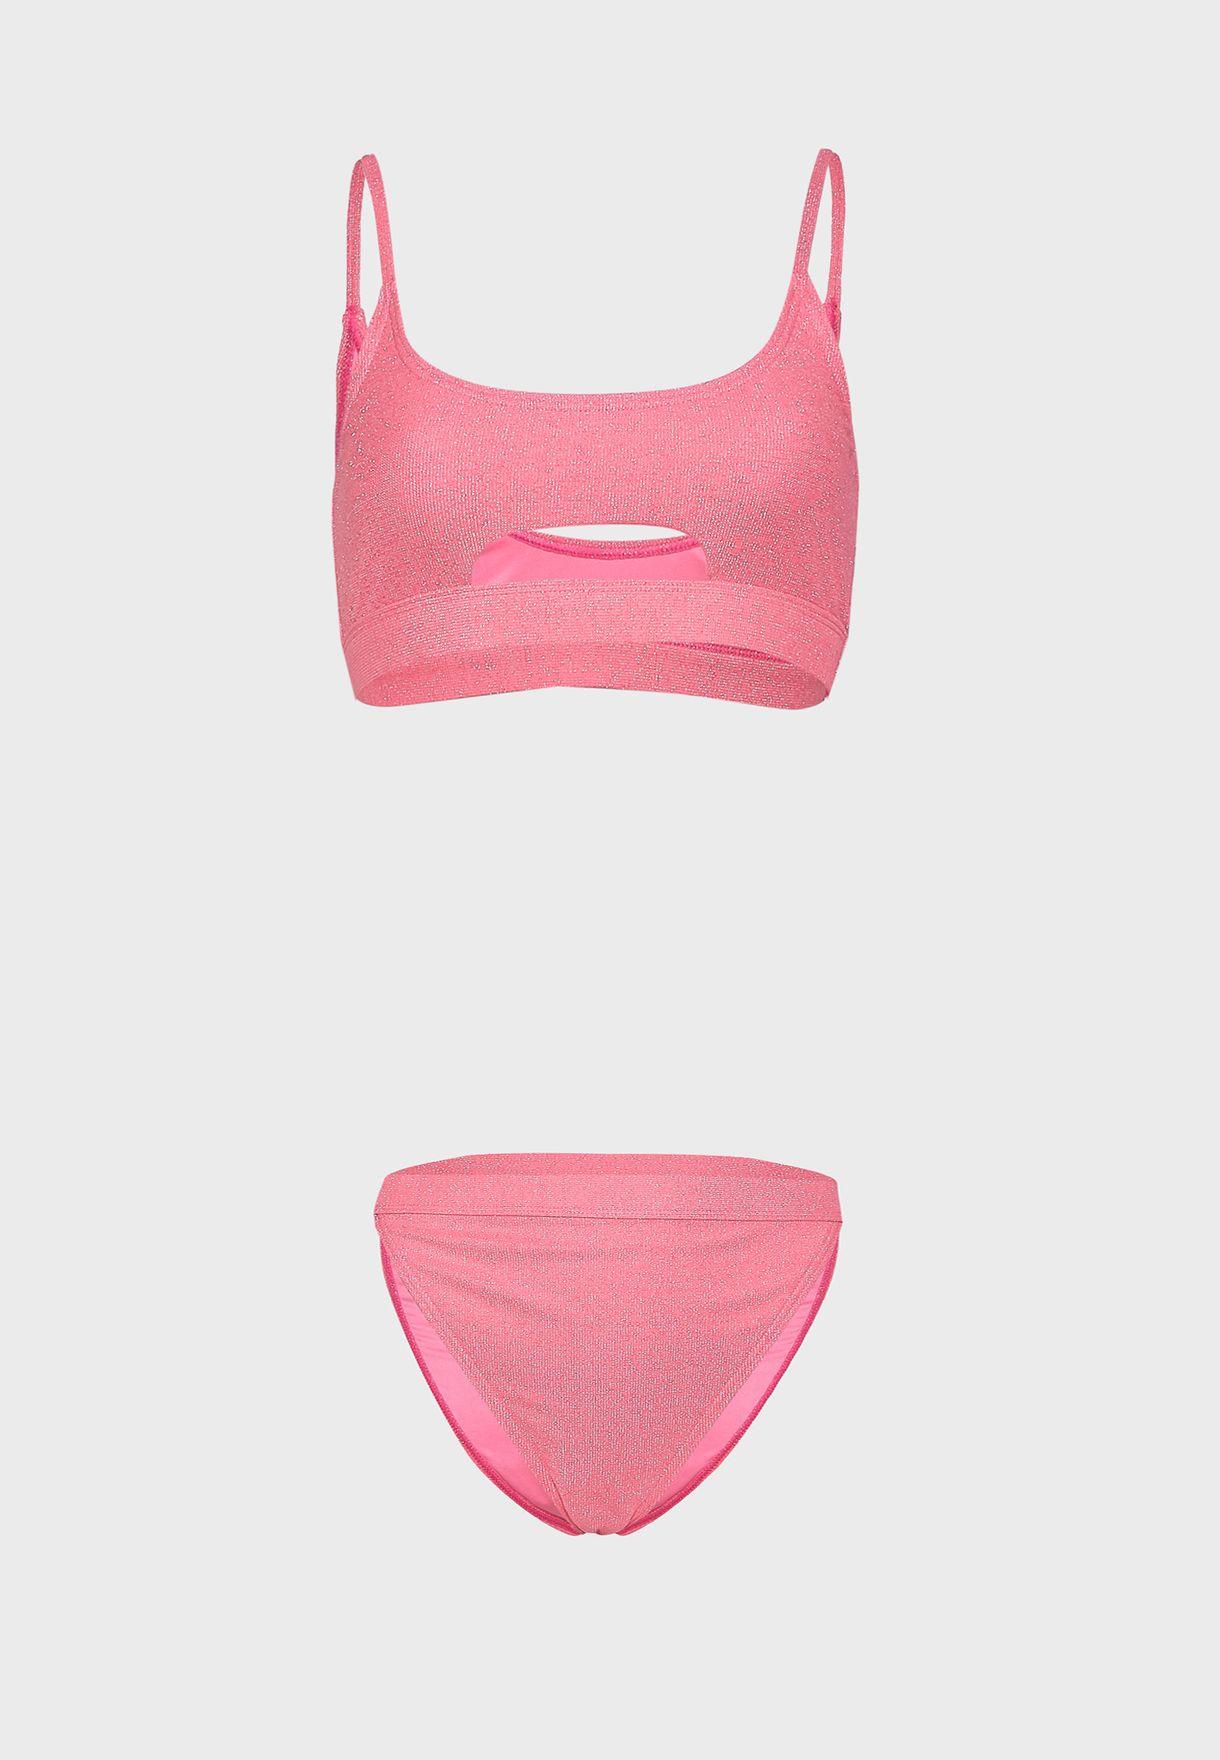 Cut Out Bikini Top & Bottom Set